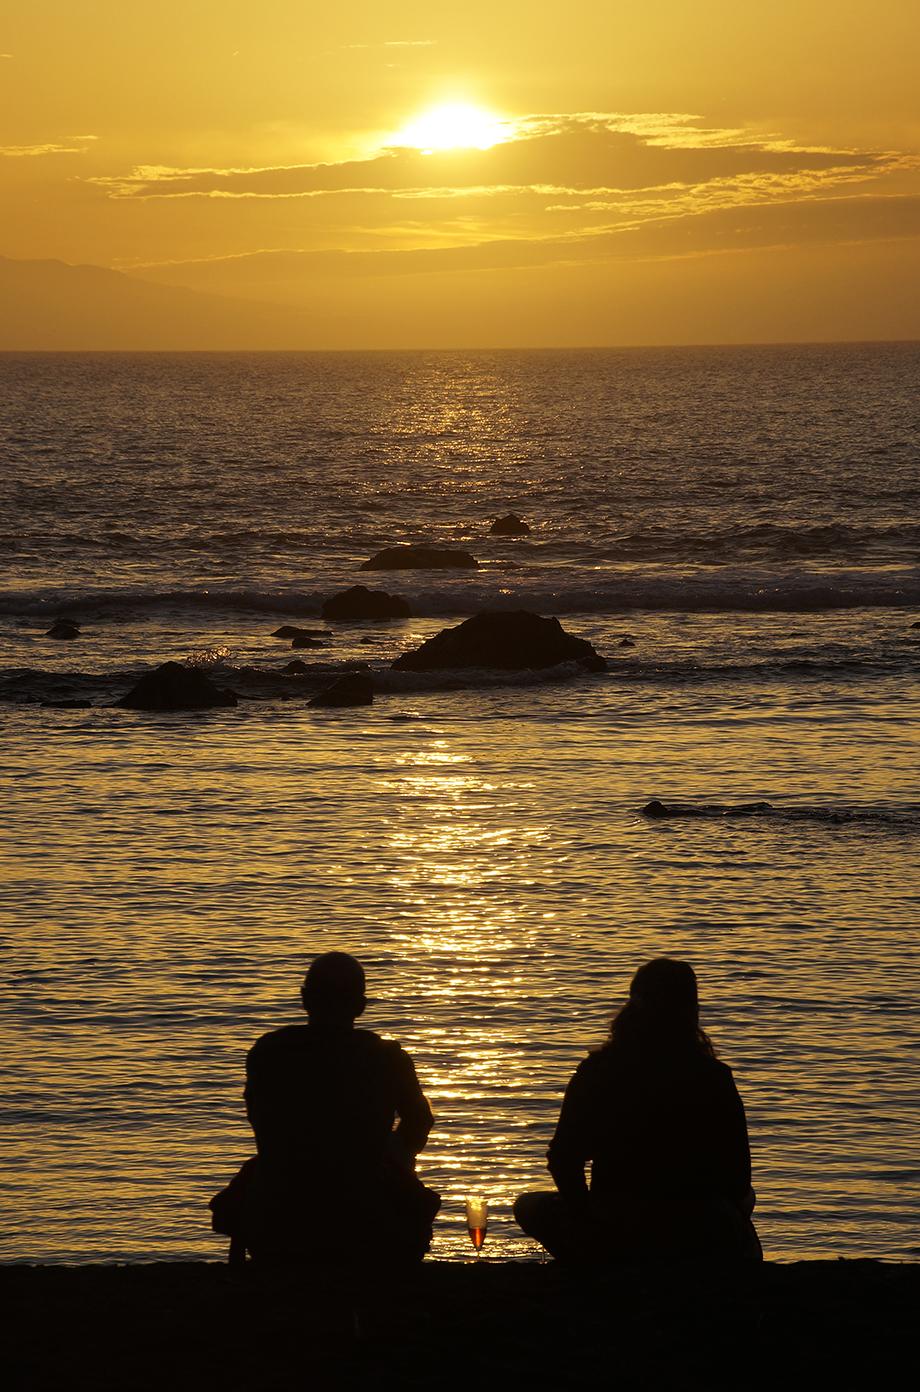 YNAS REISEN | Blog | Sonnenuntergang